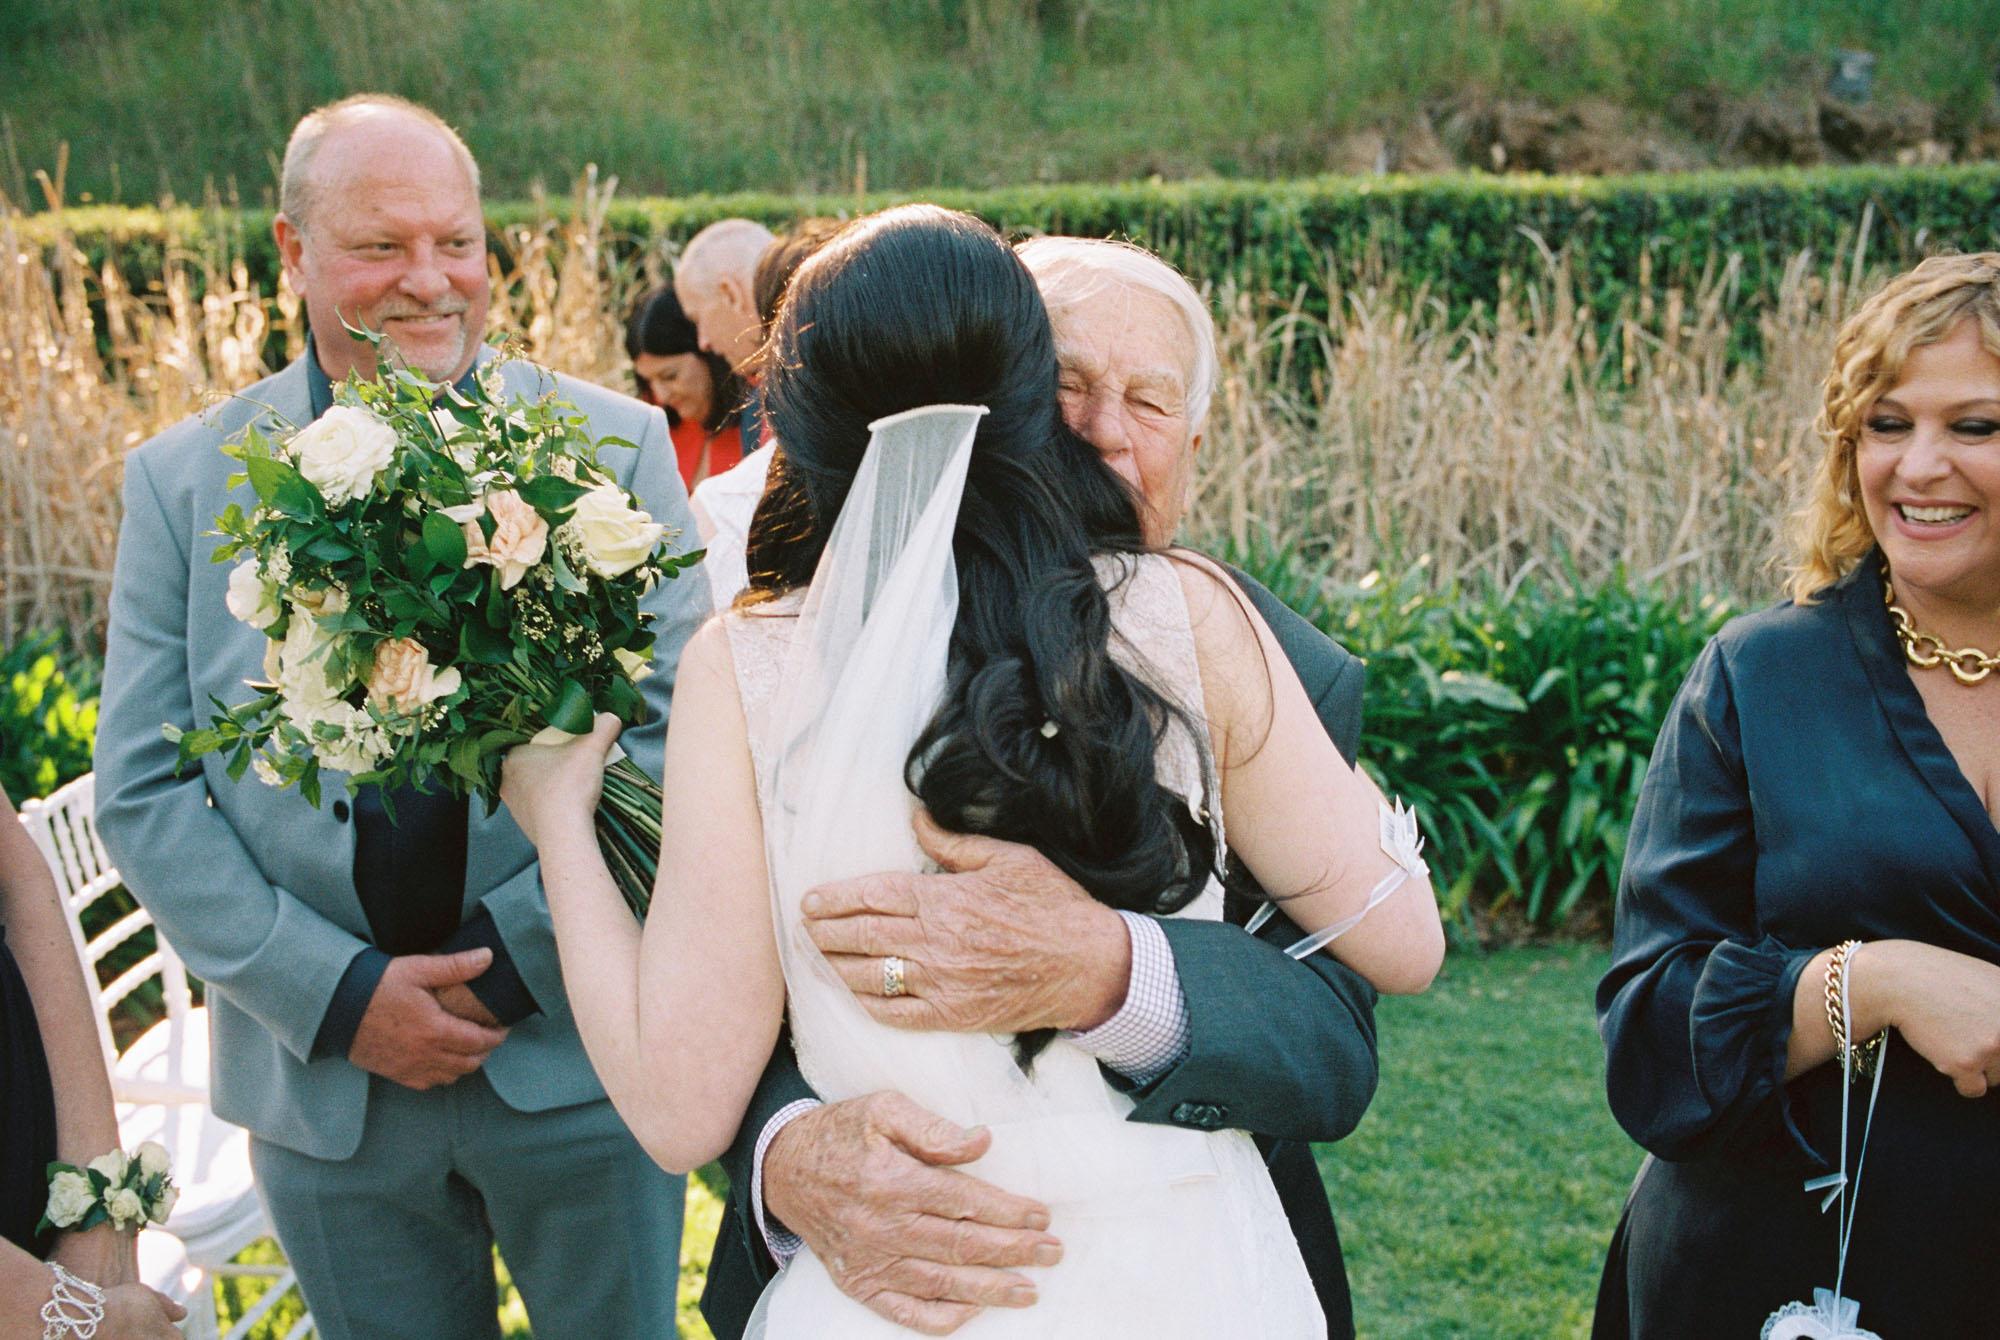 Glen-Ewin-Estate-wedding-photography-051.jpg